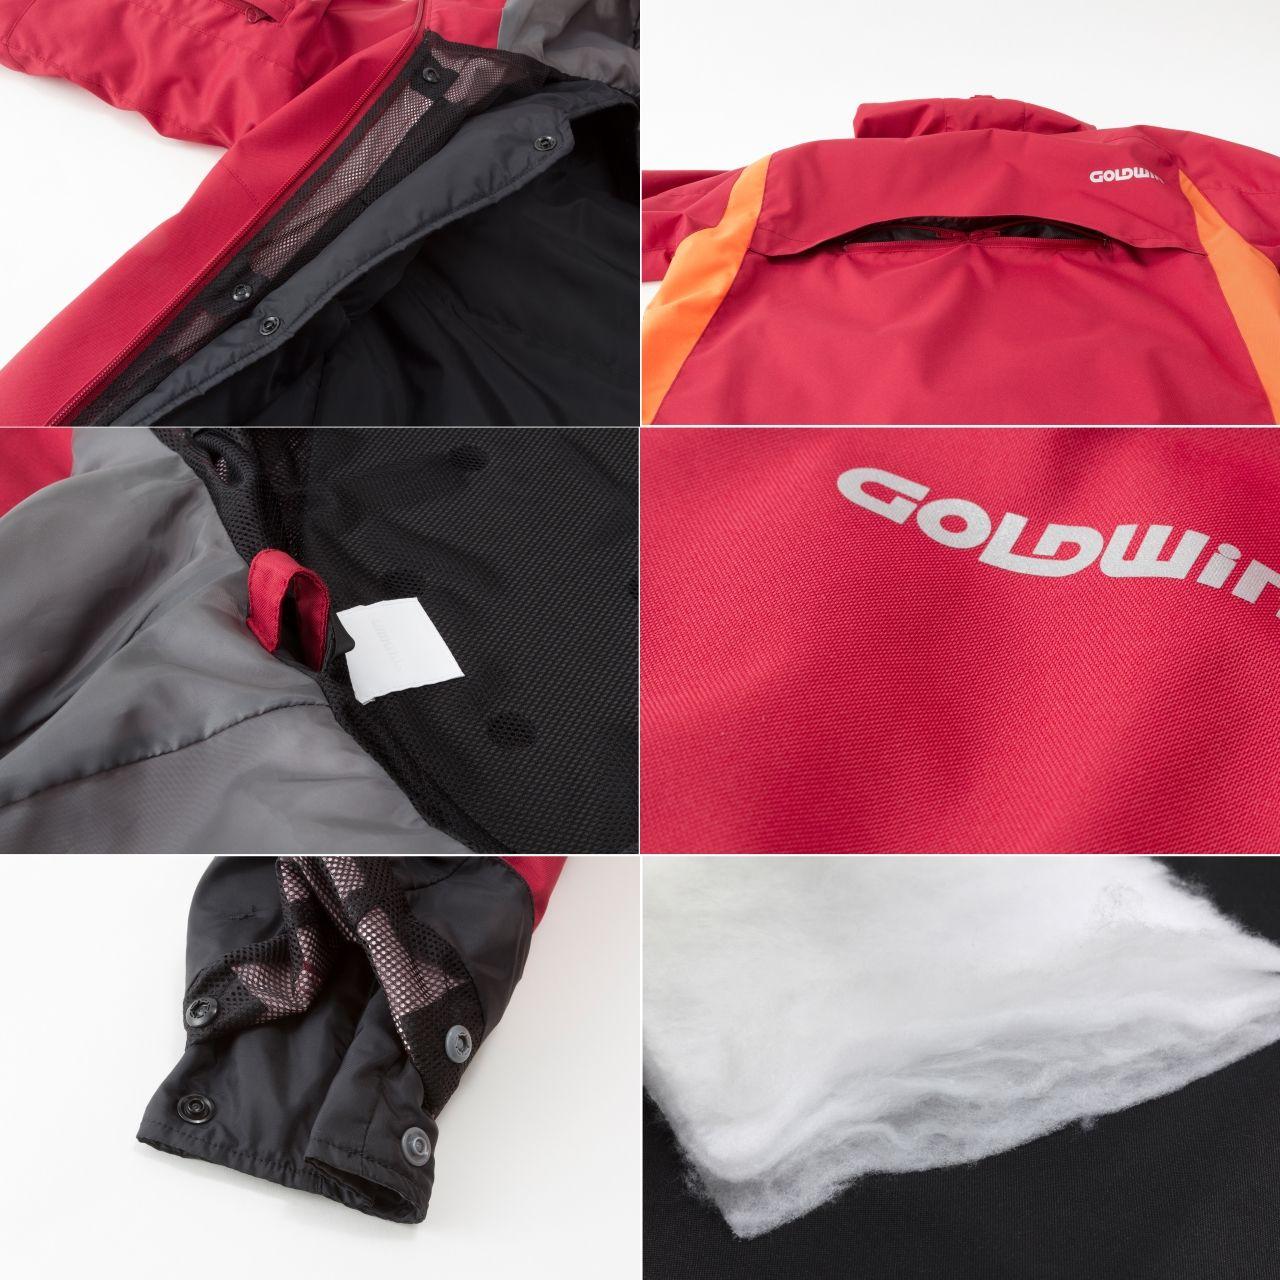 【GOLDWIN】GWS 多功能連帽全天候外套 GSM12658 - 「Webike-摩托百貨」